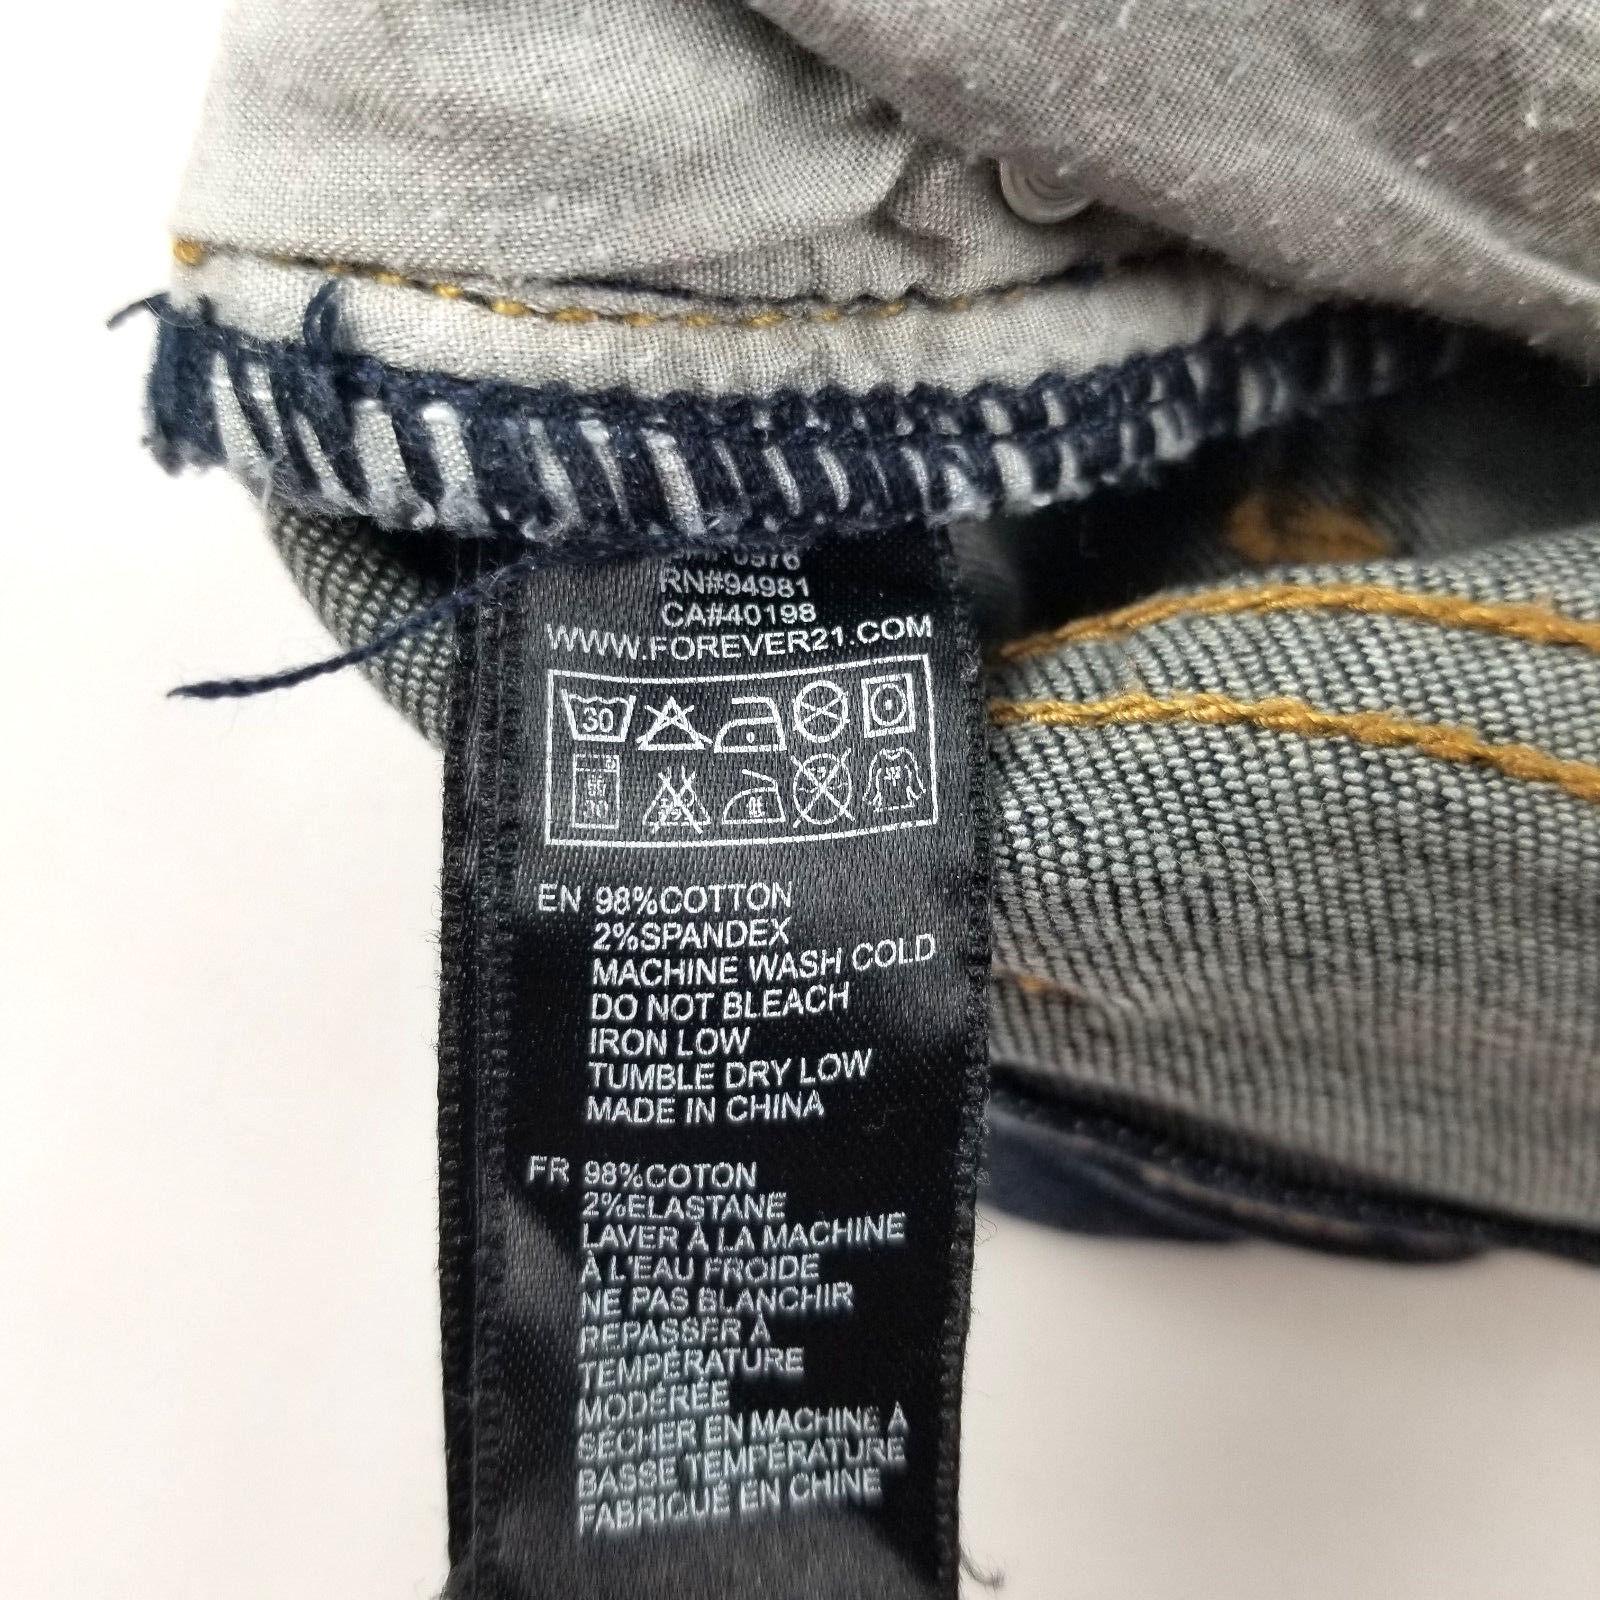 2.1 Denim Womens Jean Short Shorts Size 27 Flower Detail Distressed image 5